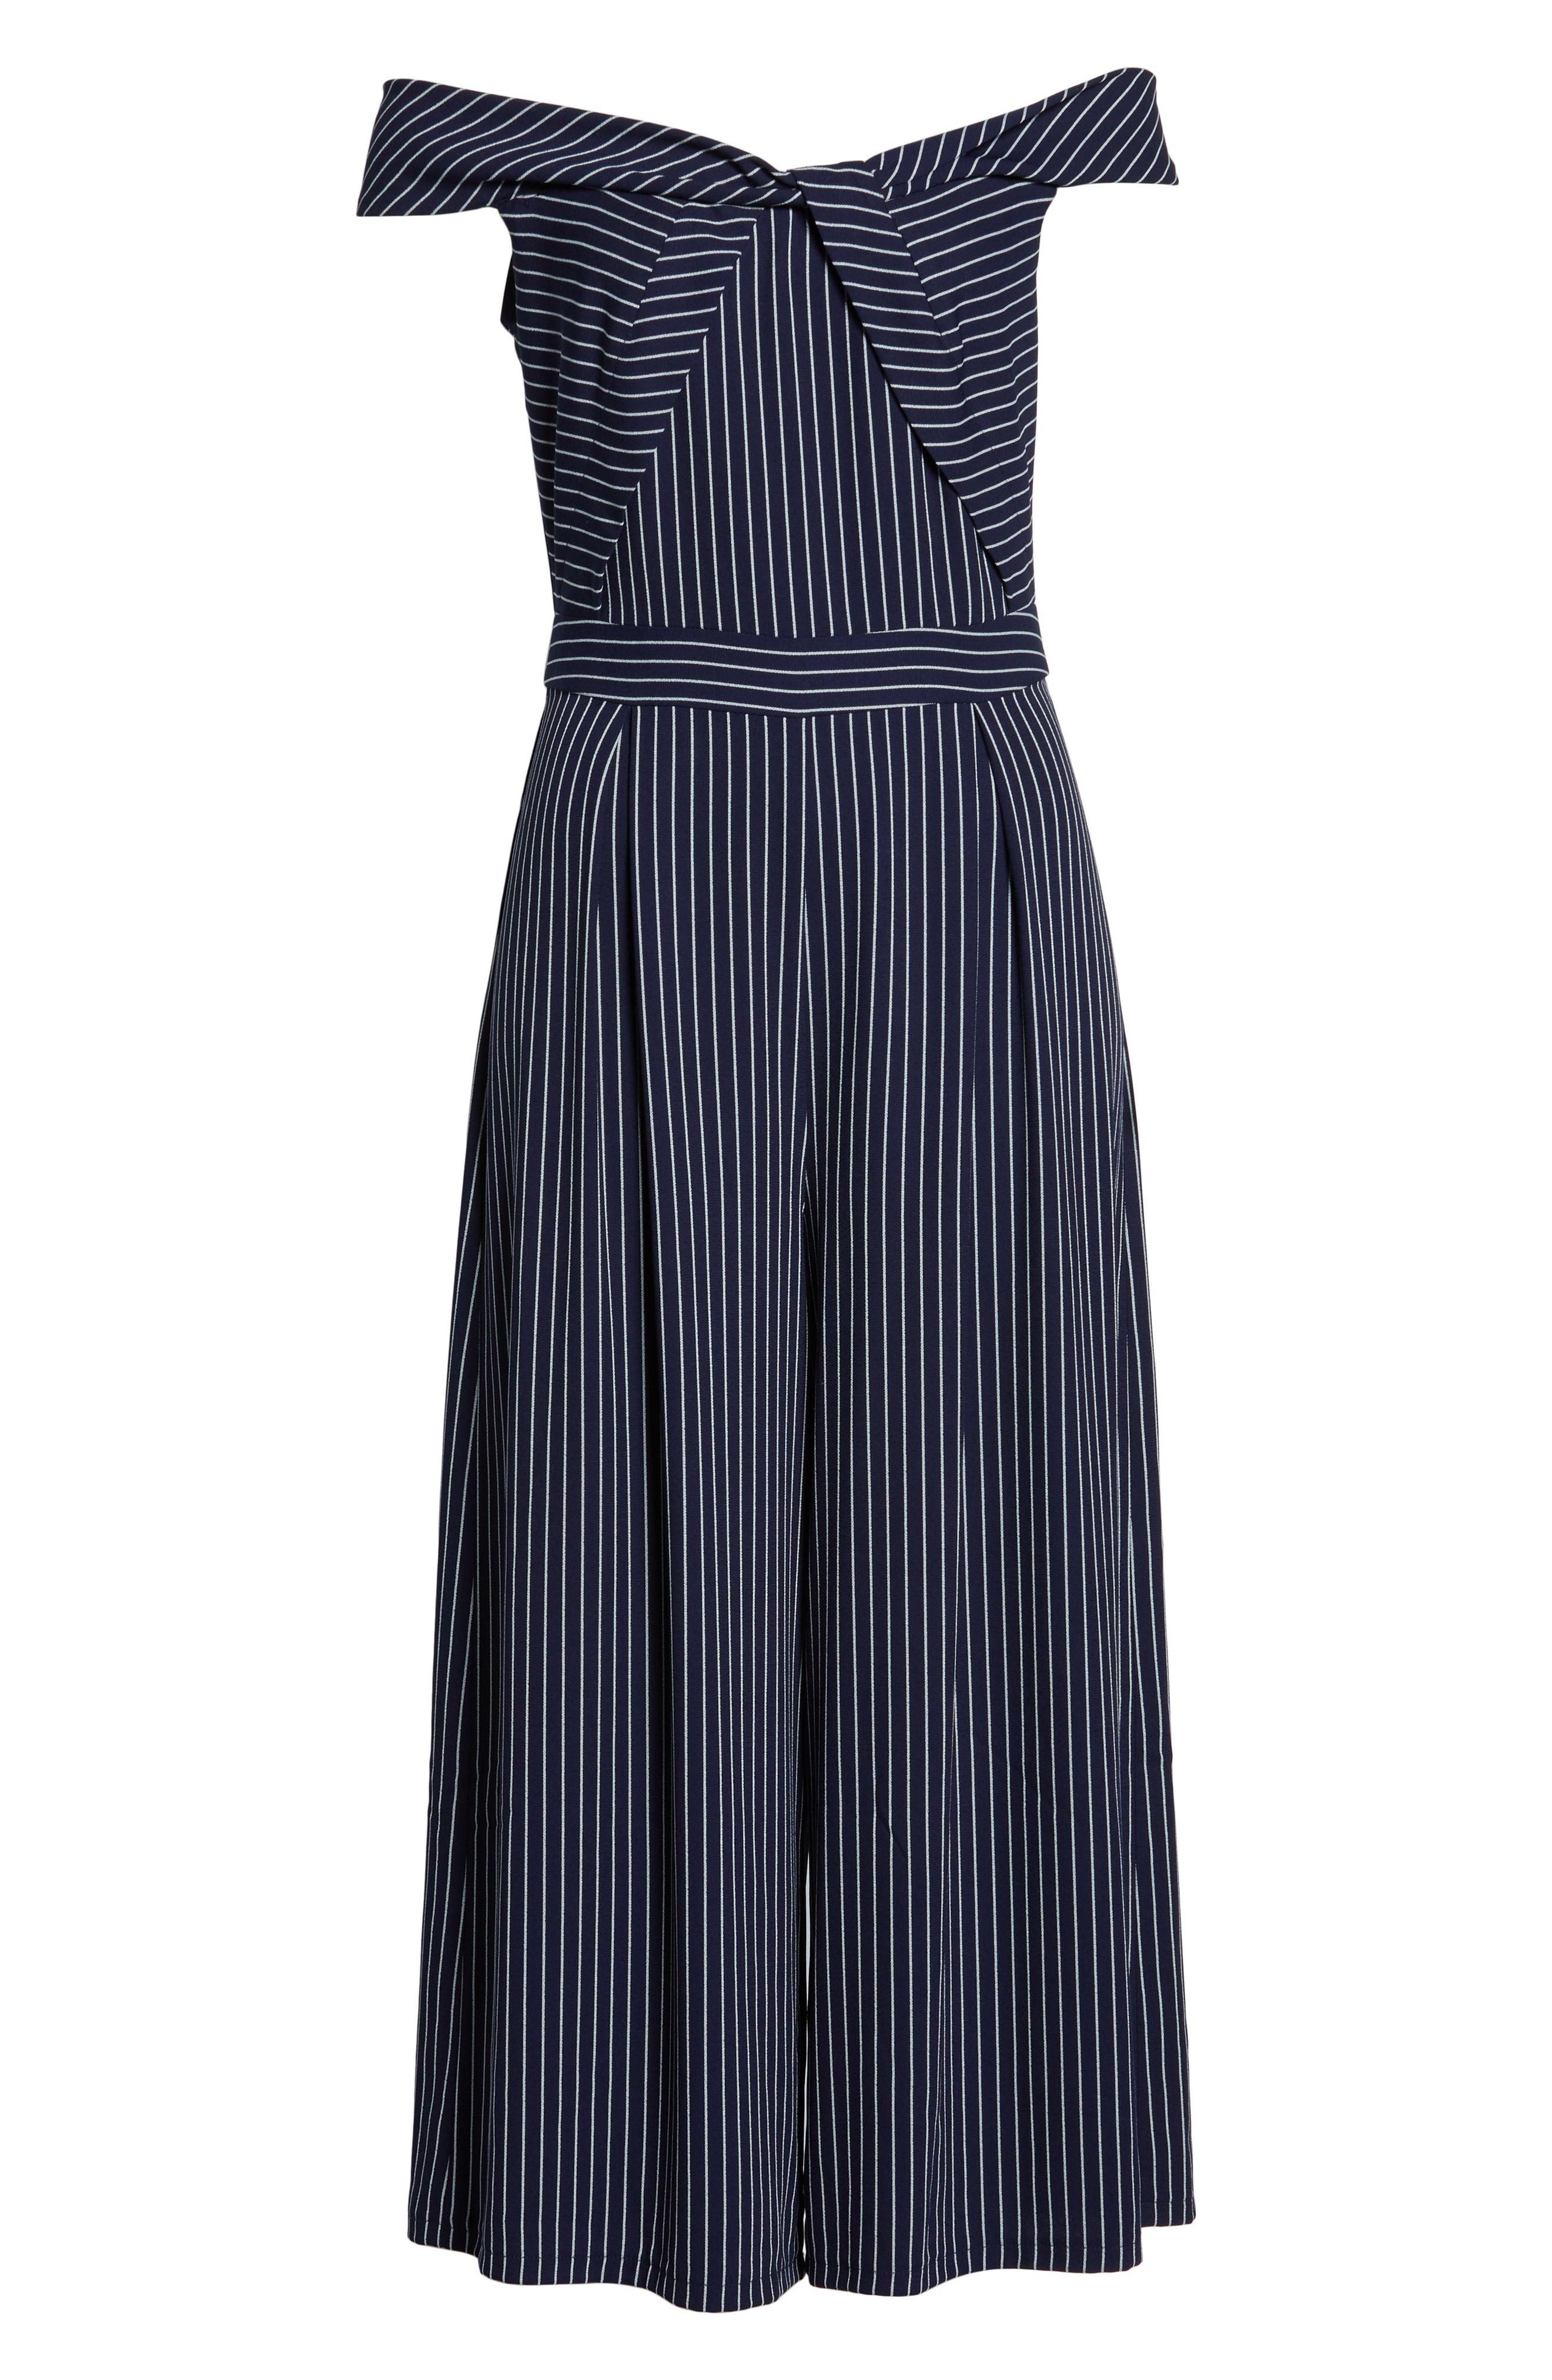 beec2d5460 Long Sleeve Black Dressy Jumpsuits - Gomes Weine AG